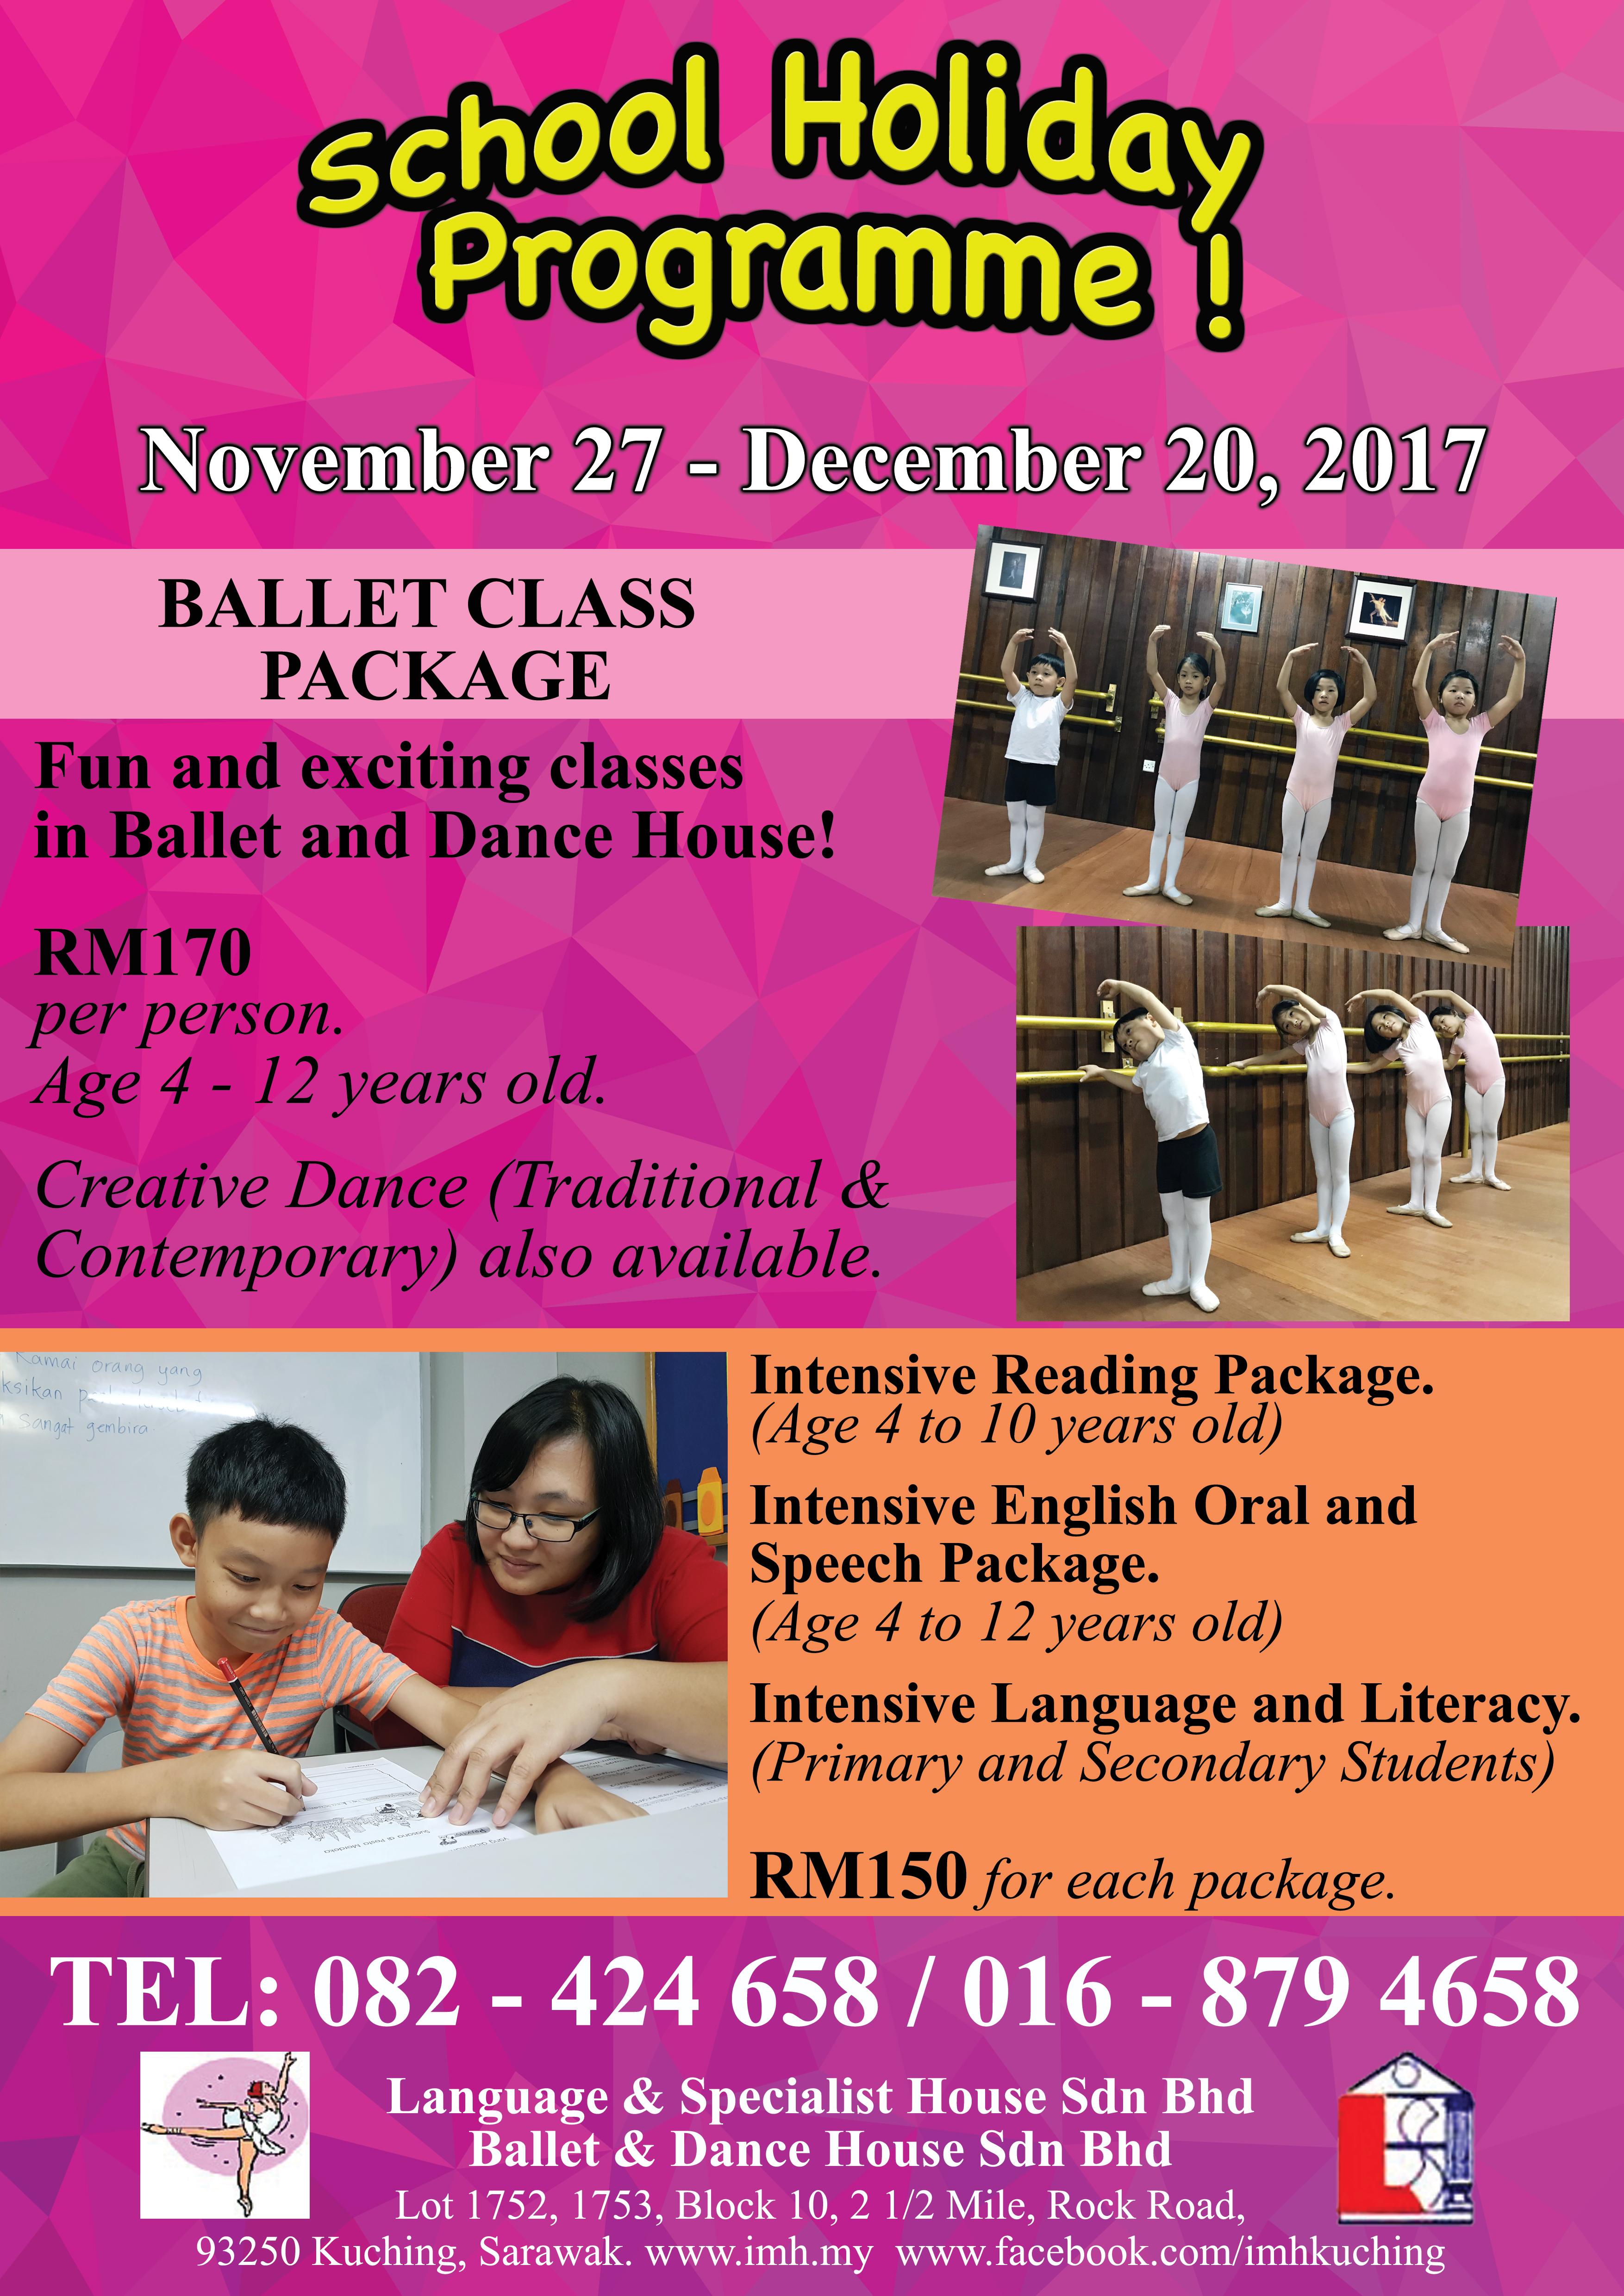 BalletandLSHHolidayProgramme2017